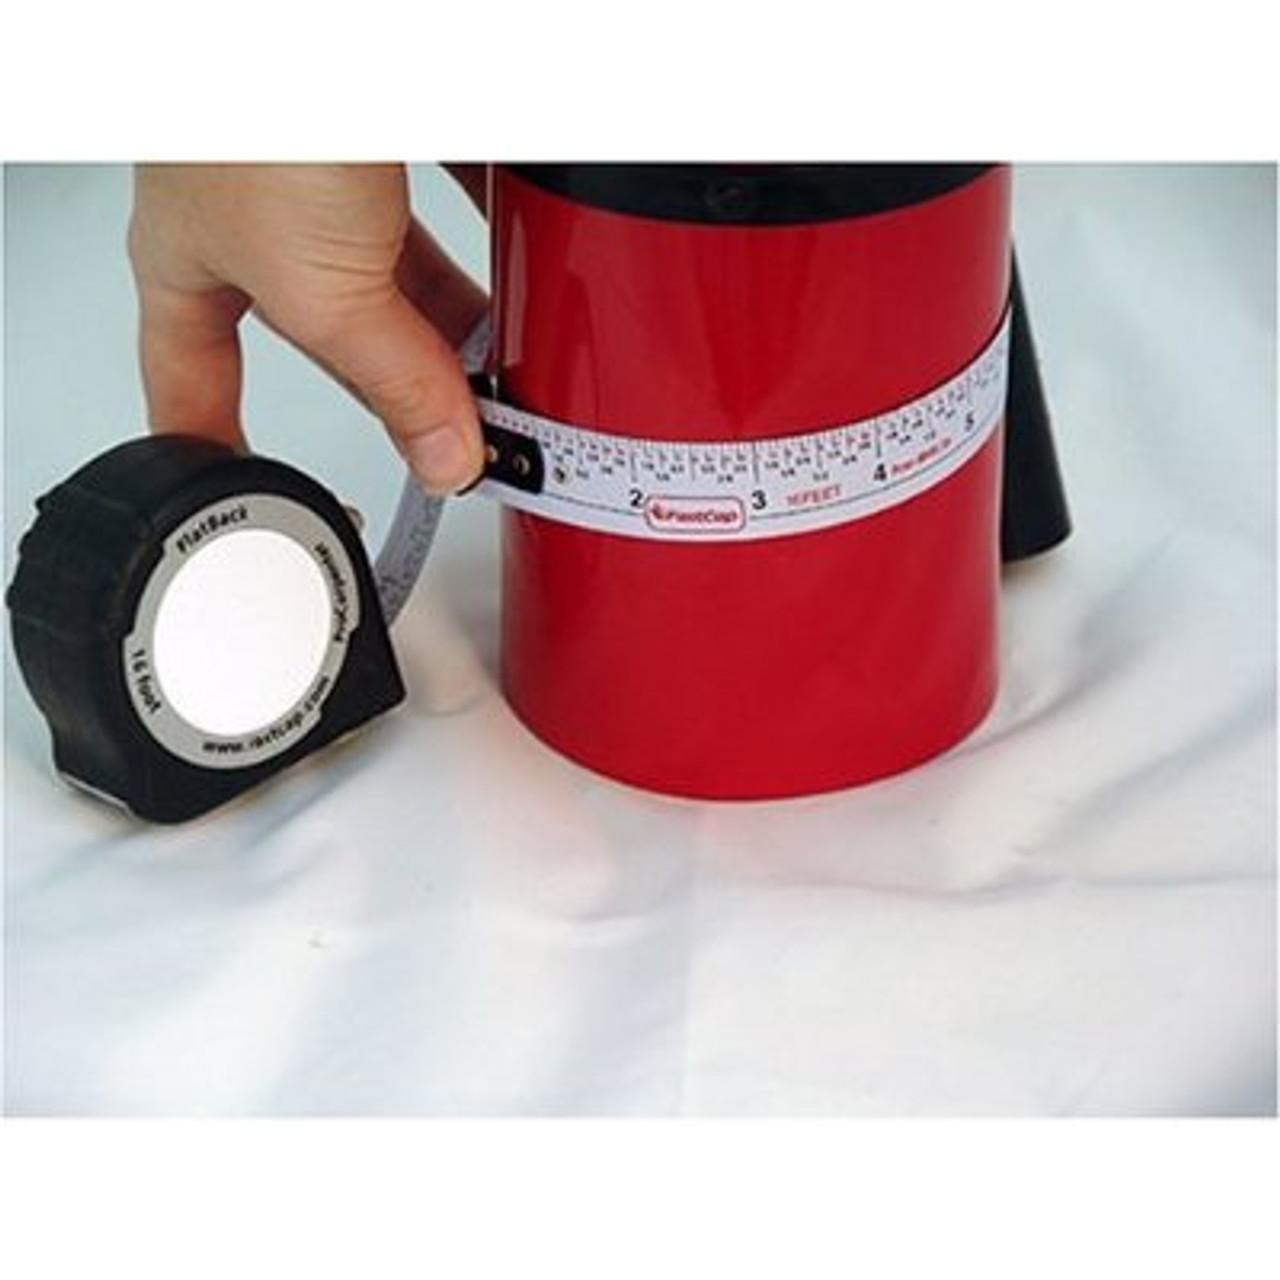 Flatback Standard & Metric Measuring Tape 16 FT measuring round